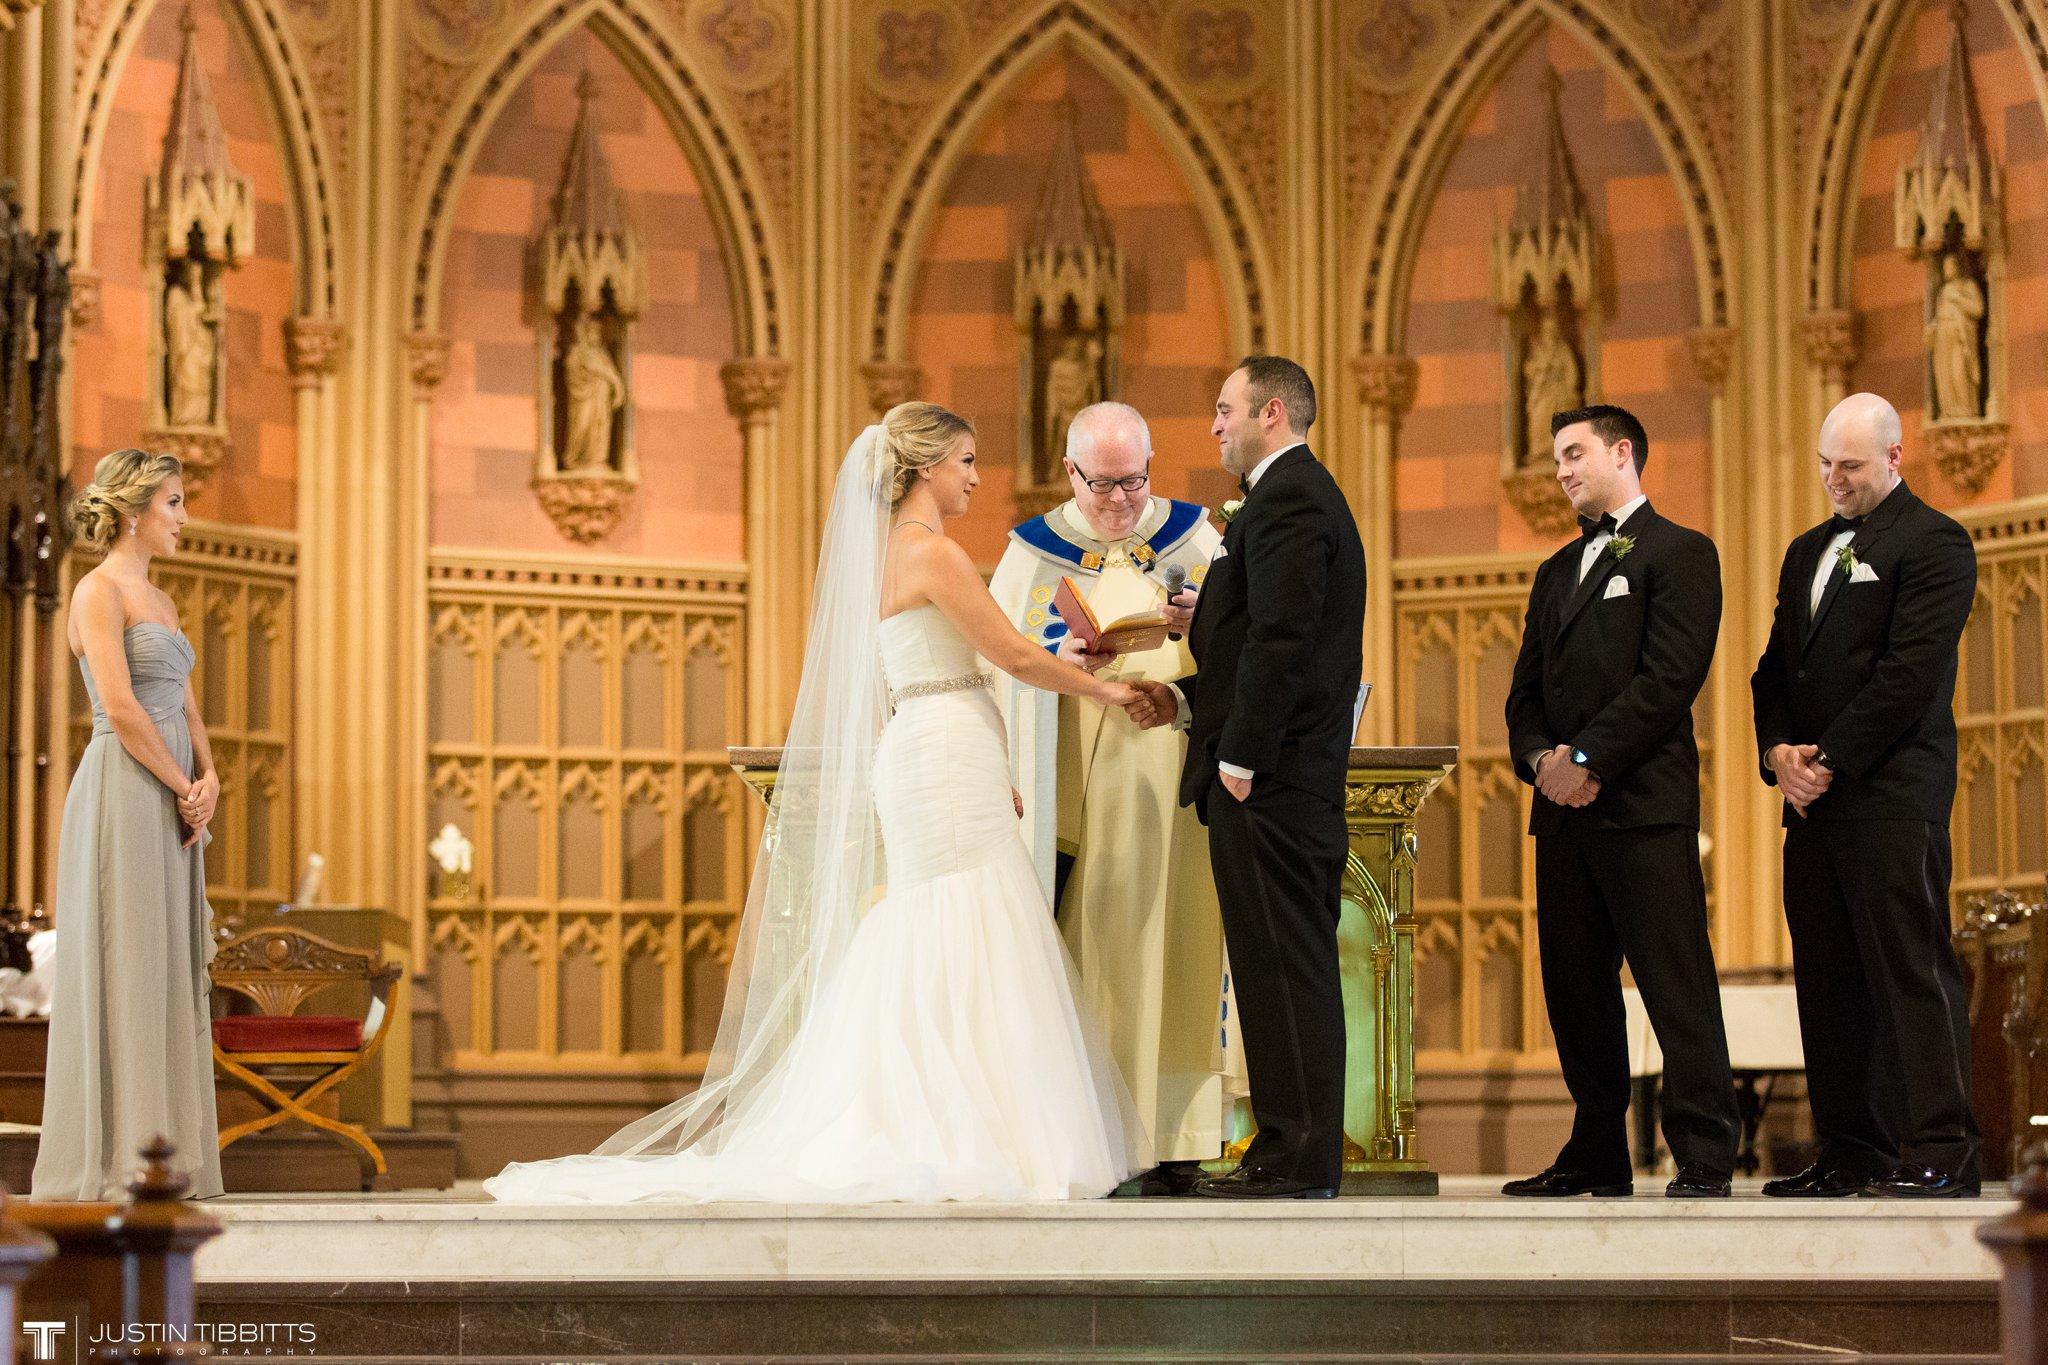 state-room-wedding-photos-with-amanda-and-nick_0092